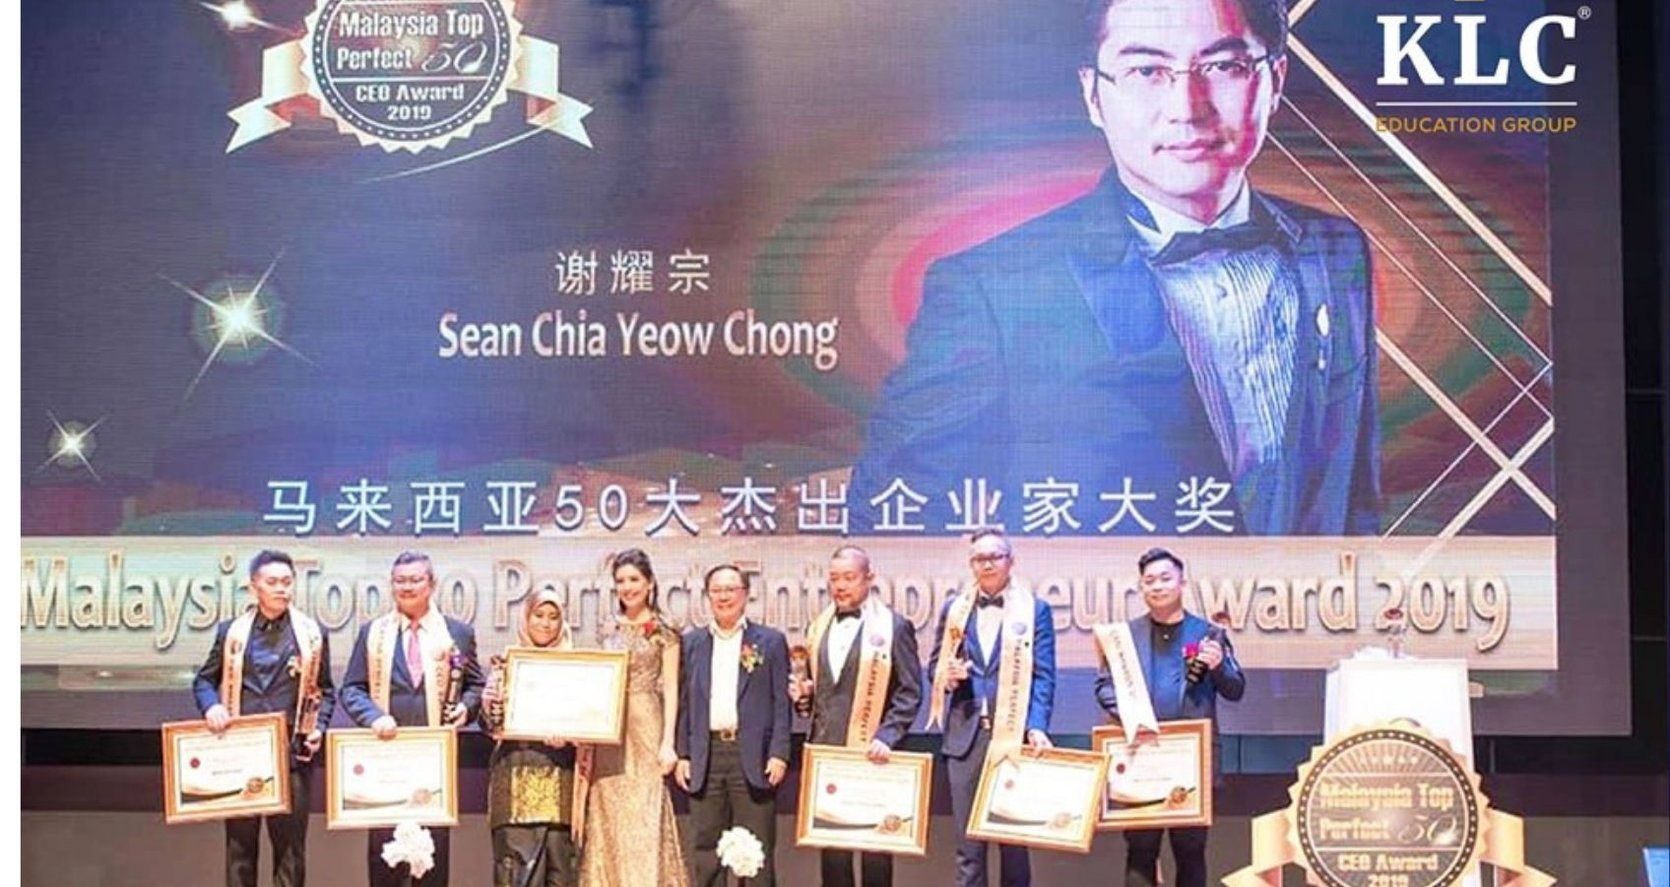 KLC执行总裁荣获首届《马来西亚50大杰出企业家大奖》